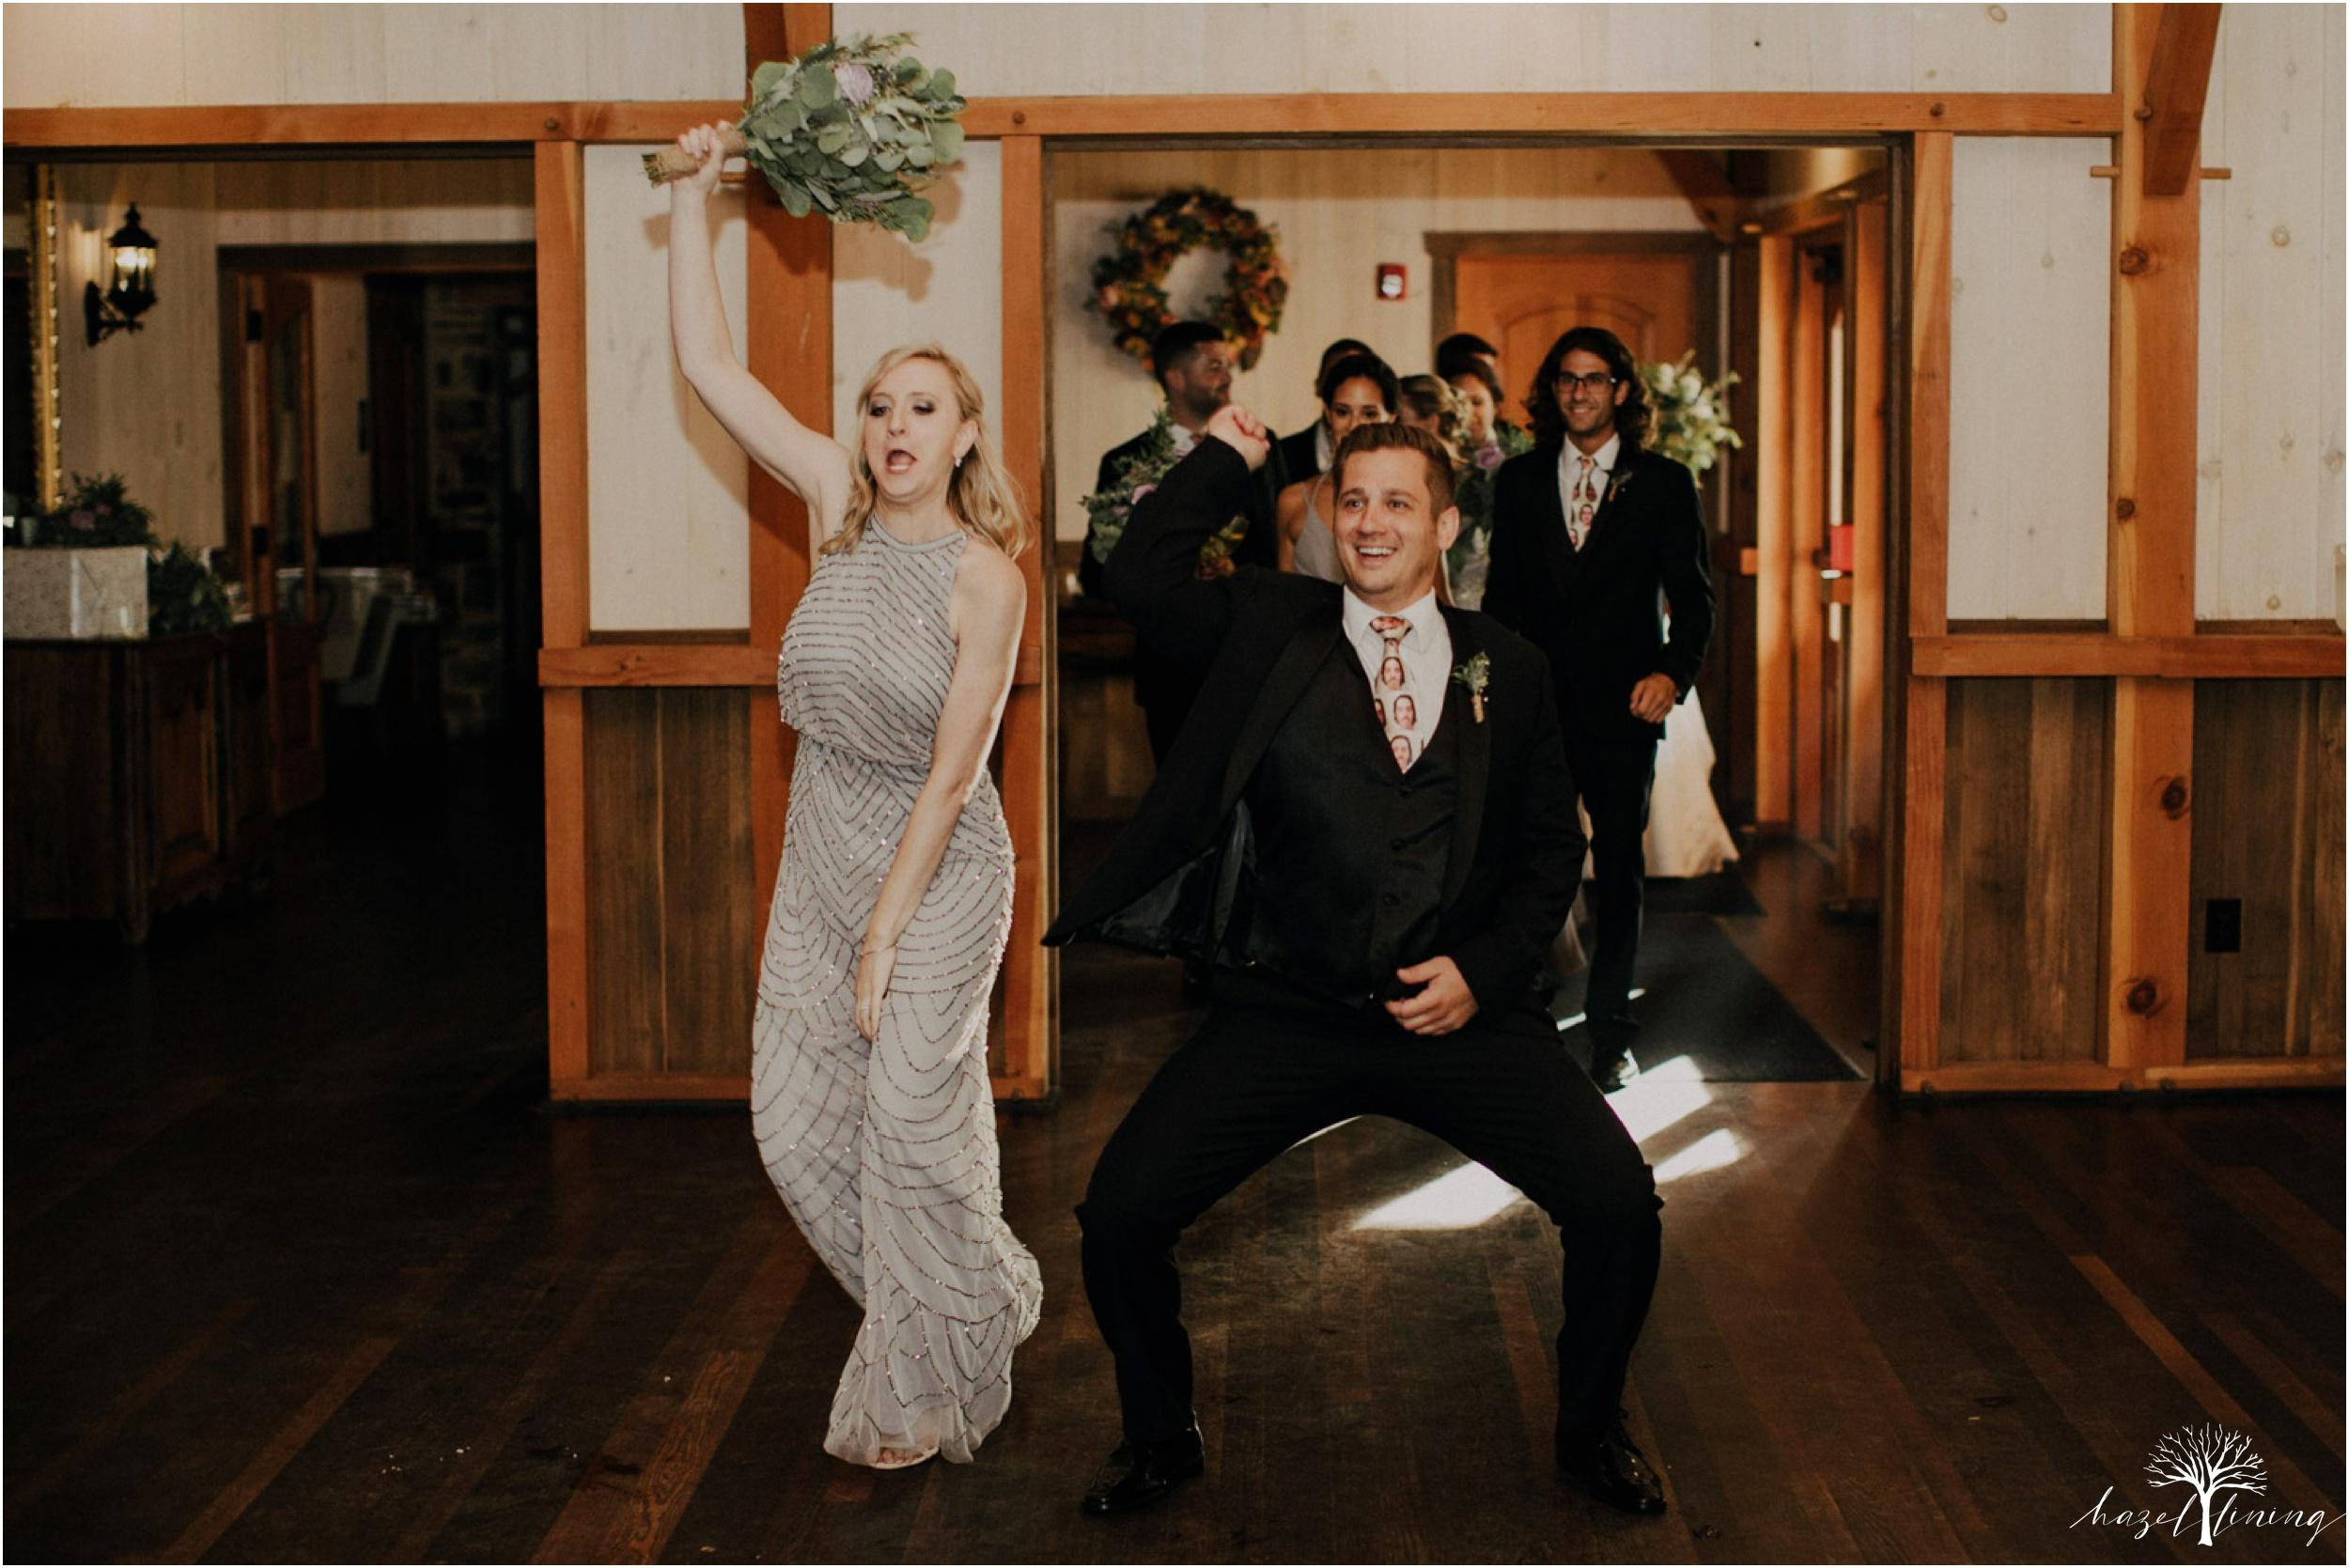 maureen-hepner-anthony-giordano-rose-bank-winery-newtow-pennsylvania-luxury-summer-wedding-hazel-lining-photography-destination-elopement-wedding-engagement-photography_0132.jpg